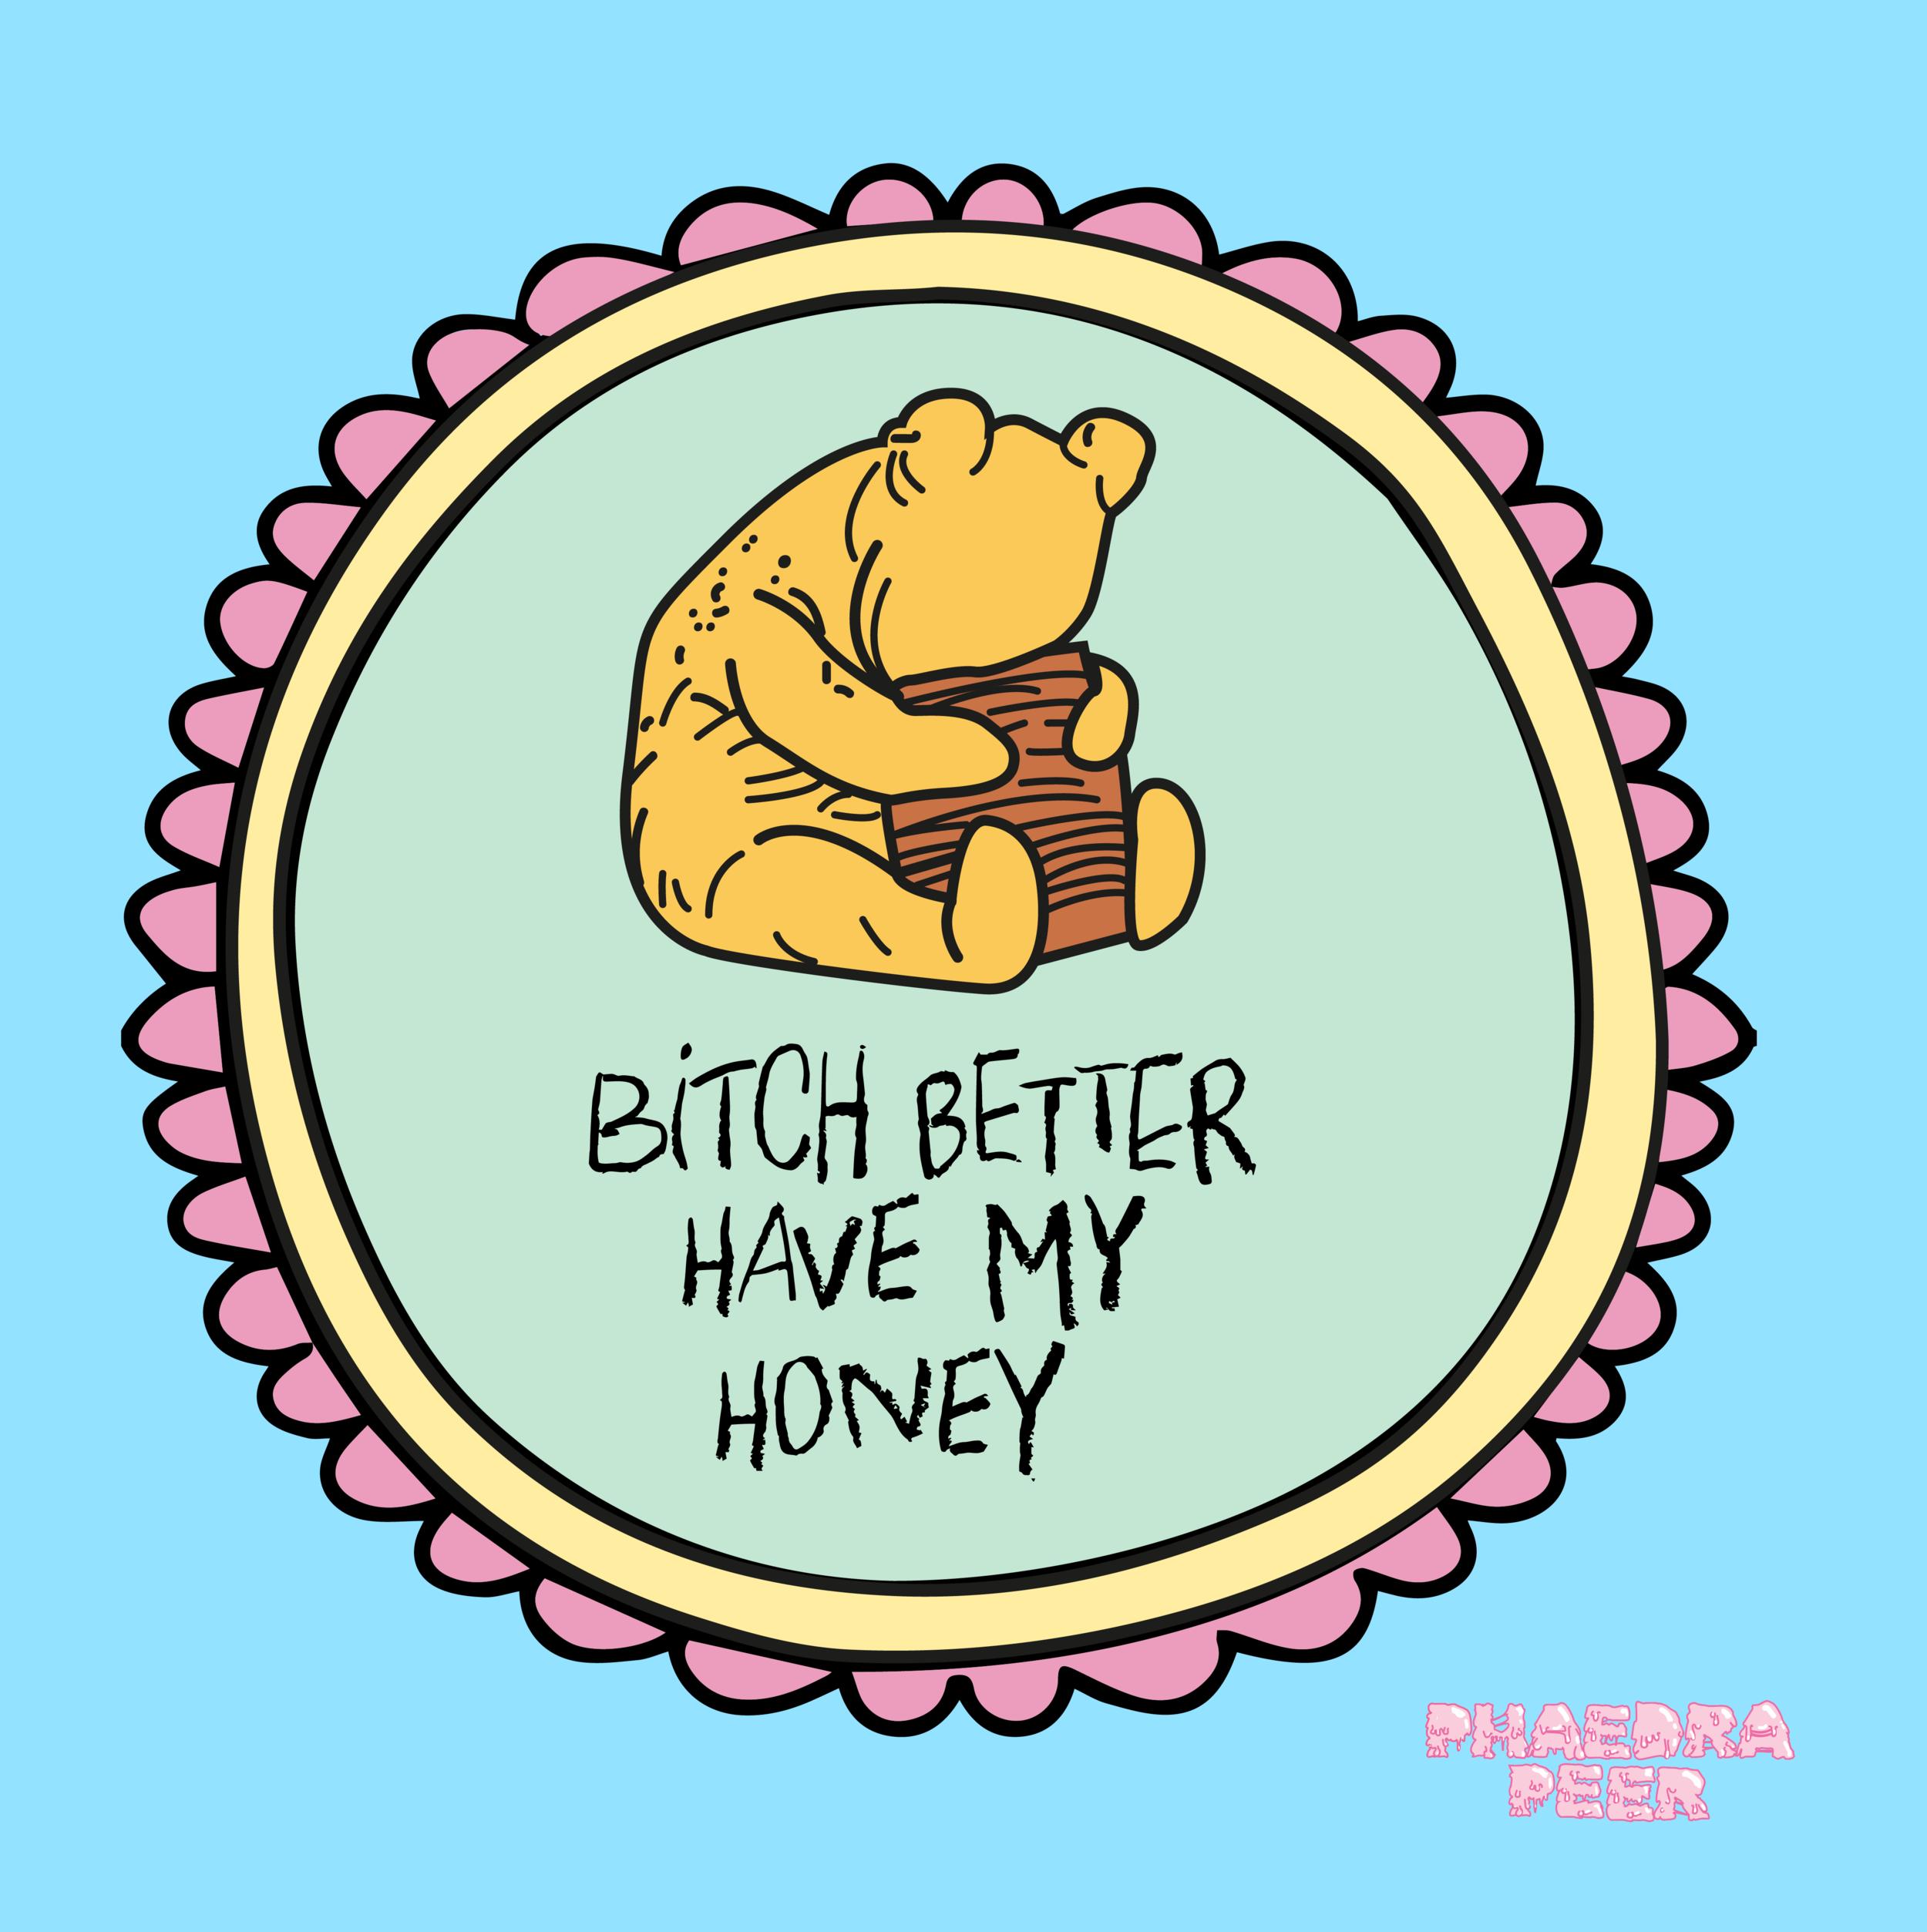 Bitch Better Have My Honey